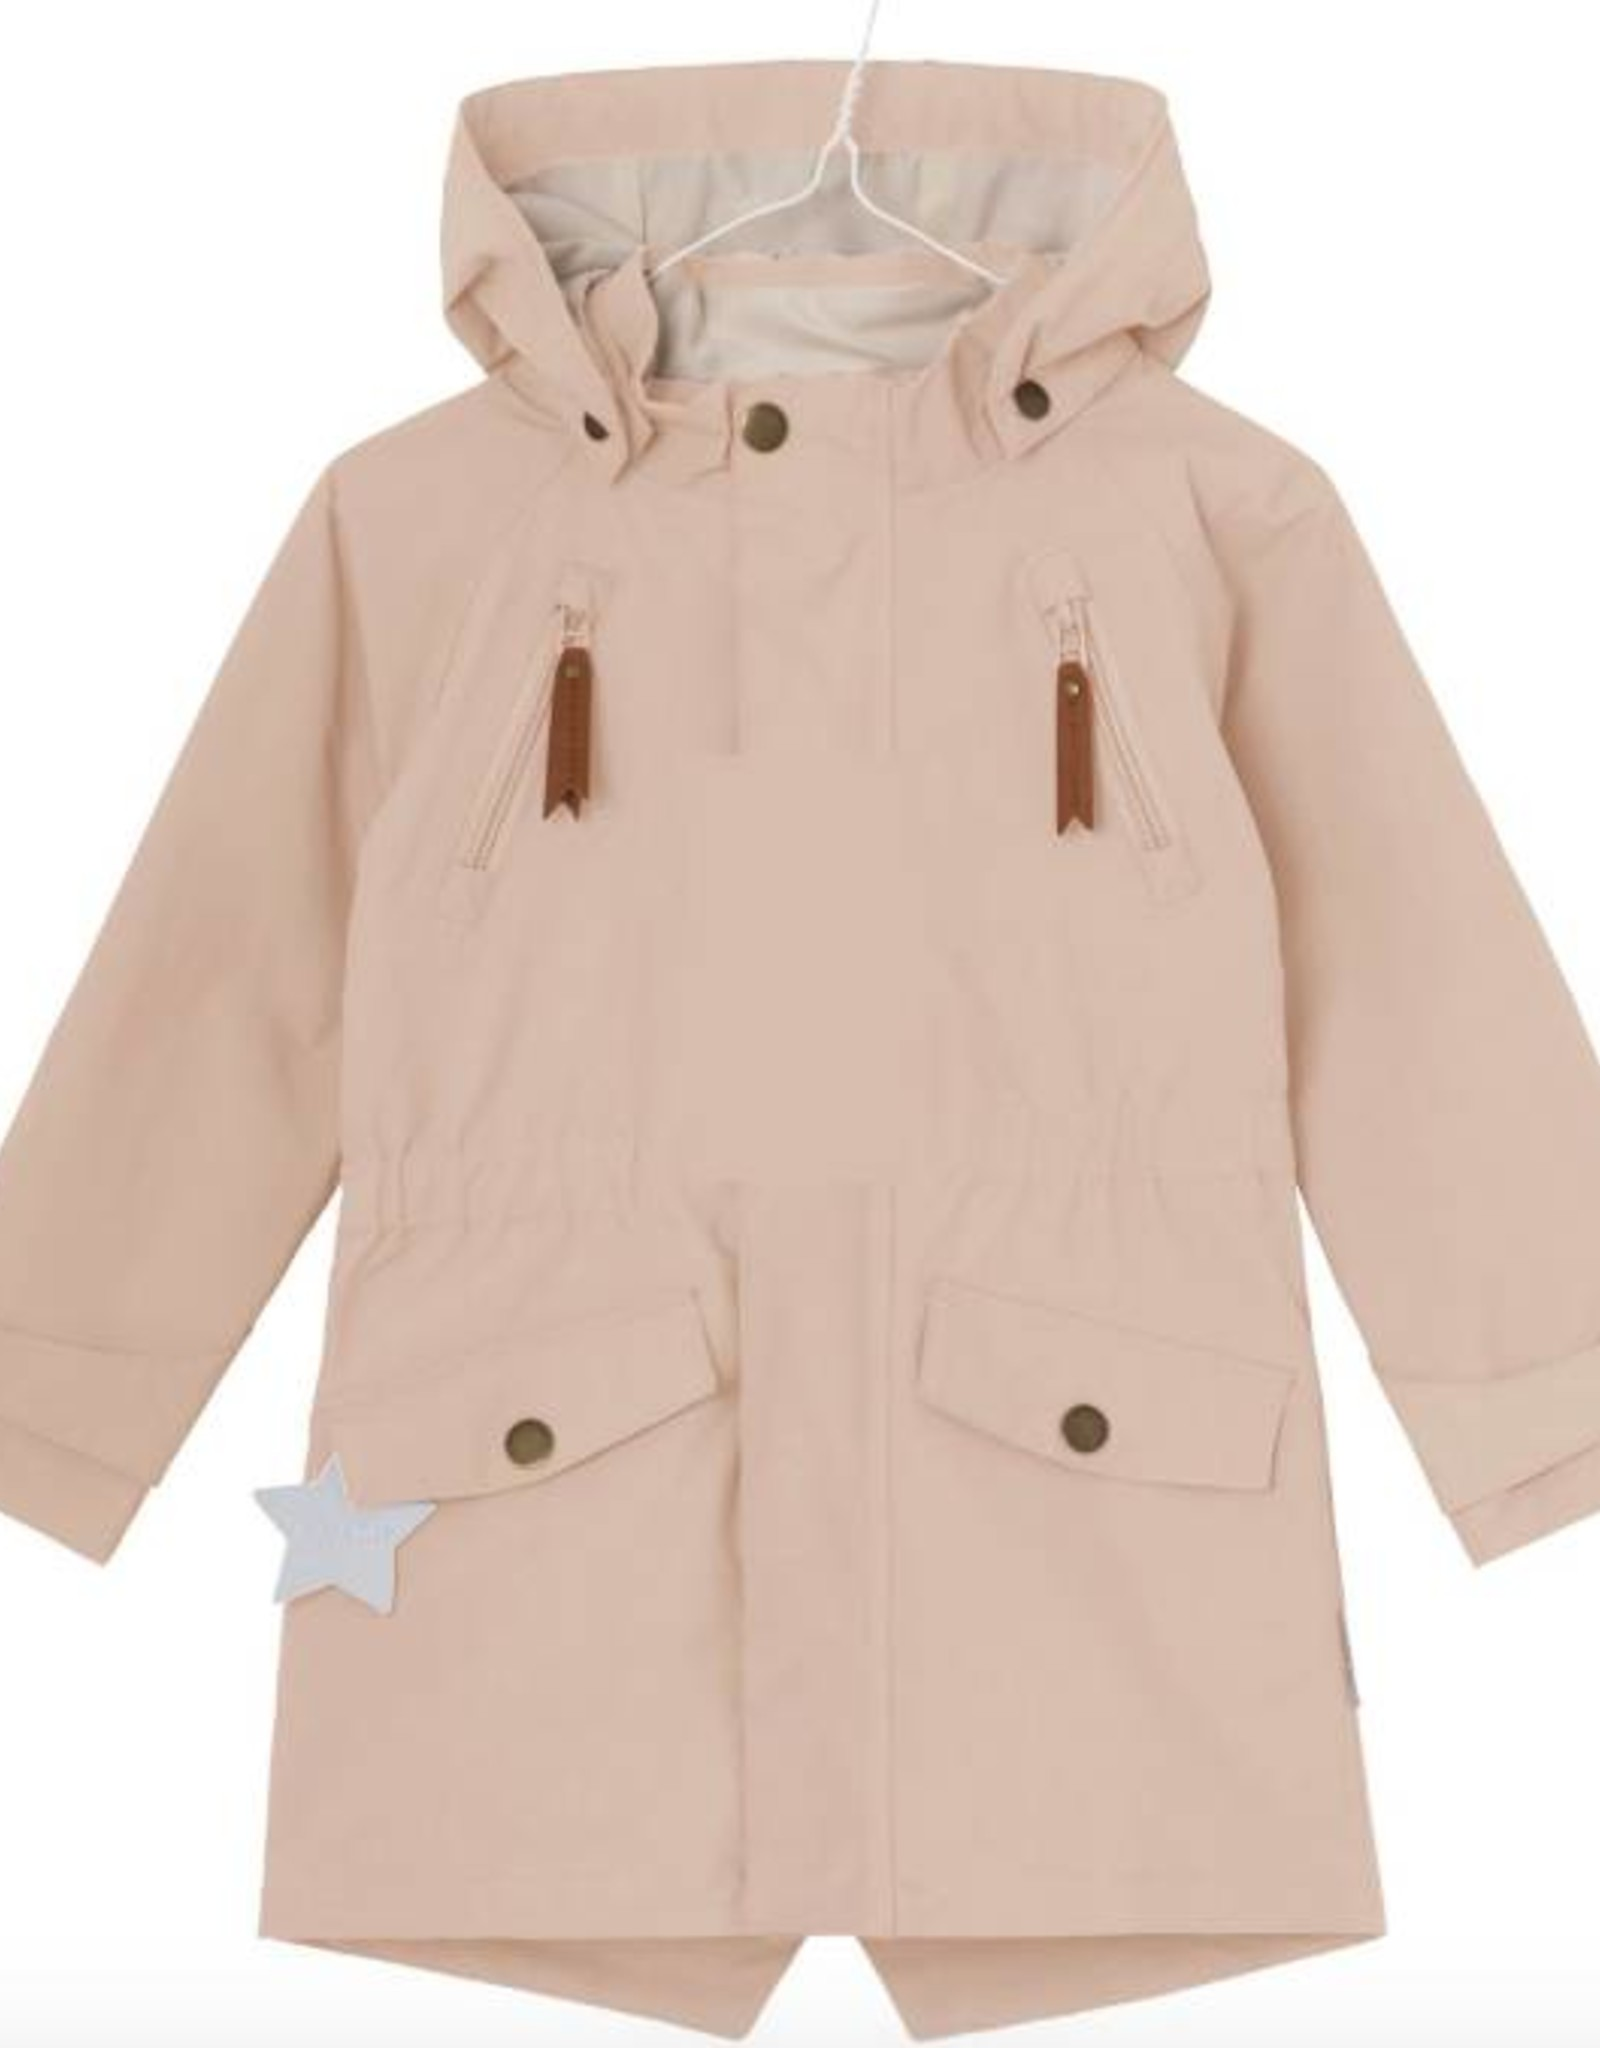 Vigga jacket